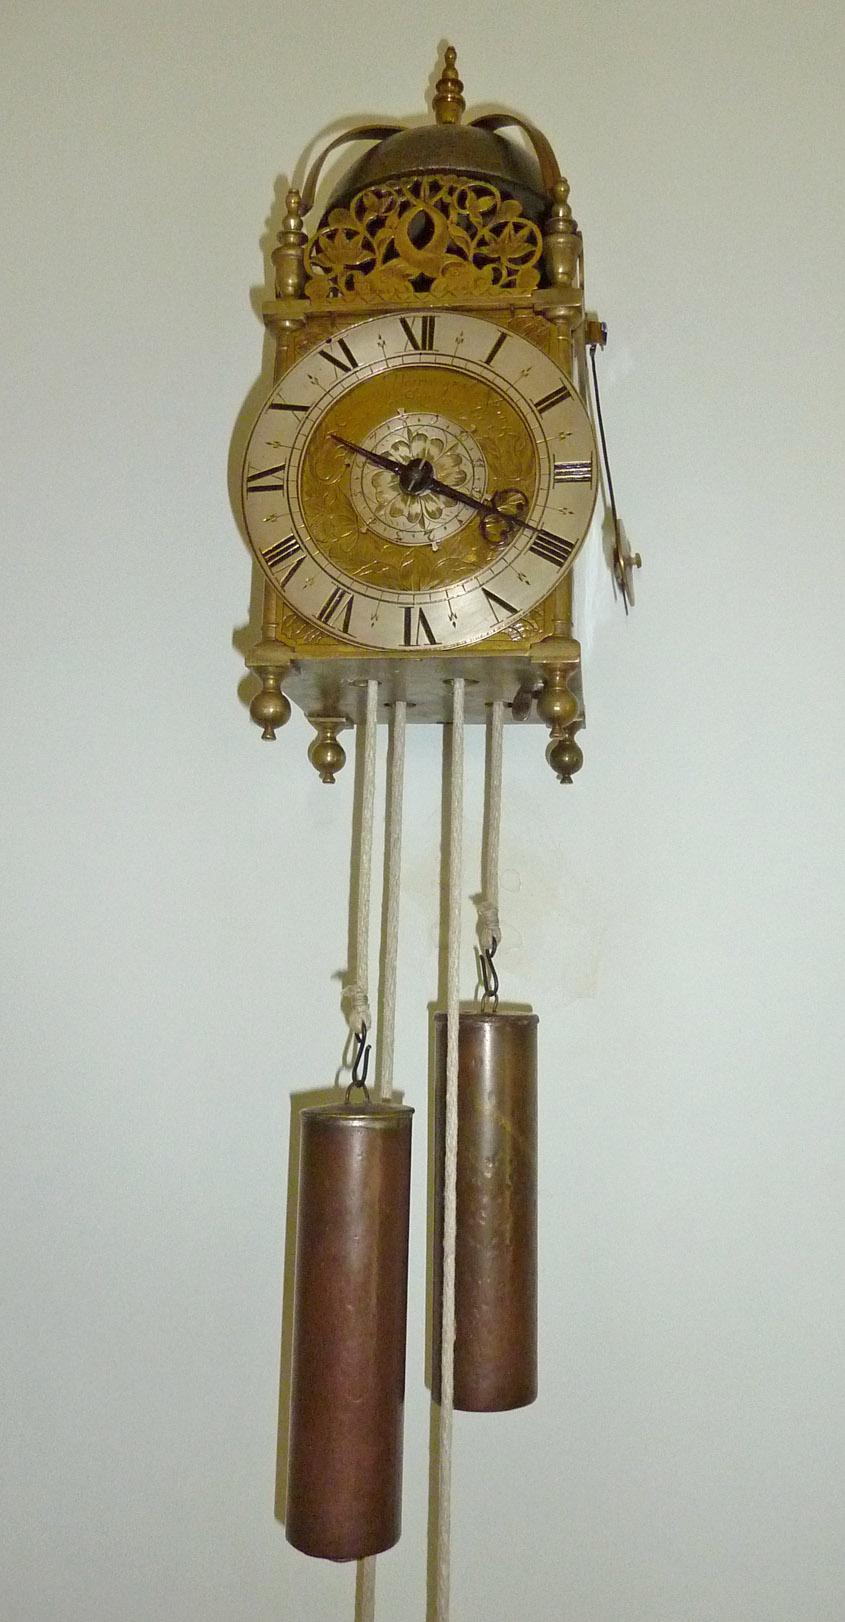 Lantern Clock at Woodford